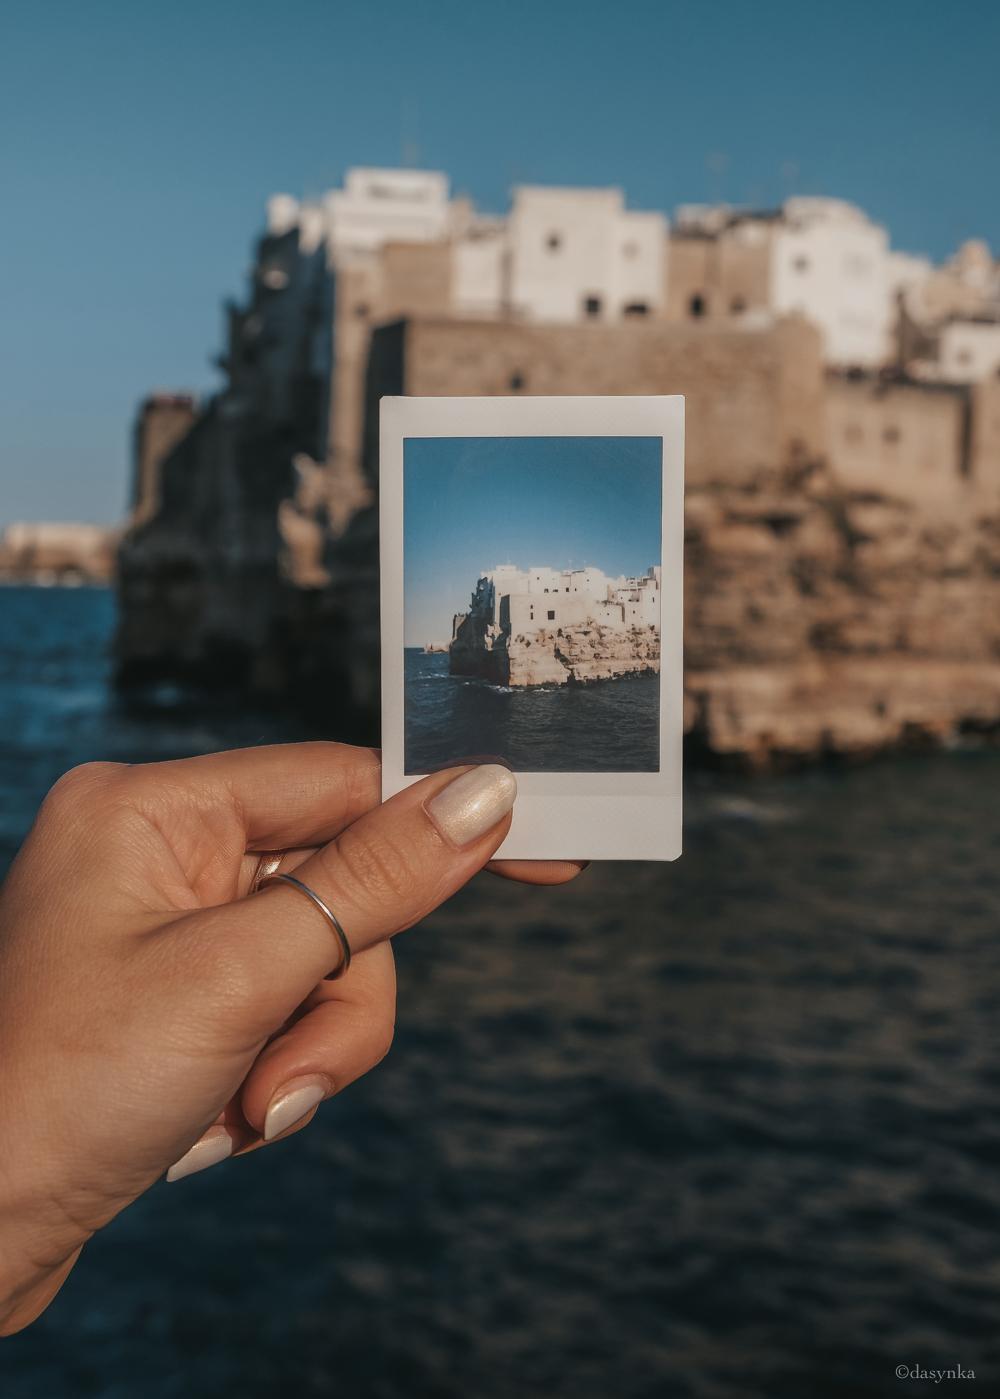 dasynka-fashion-blog-blogger-influencer-inspiration-shooting-globettrotter-travel-traveller-instagram-lifestyle-italy-ideas-italian-polaroids-polaroid-fujifilm-instax-90-8-worldmap-planisfero-mappa-mondo-pin-memories-photographs-vintage-print-polignano-puglia